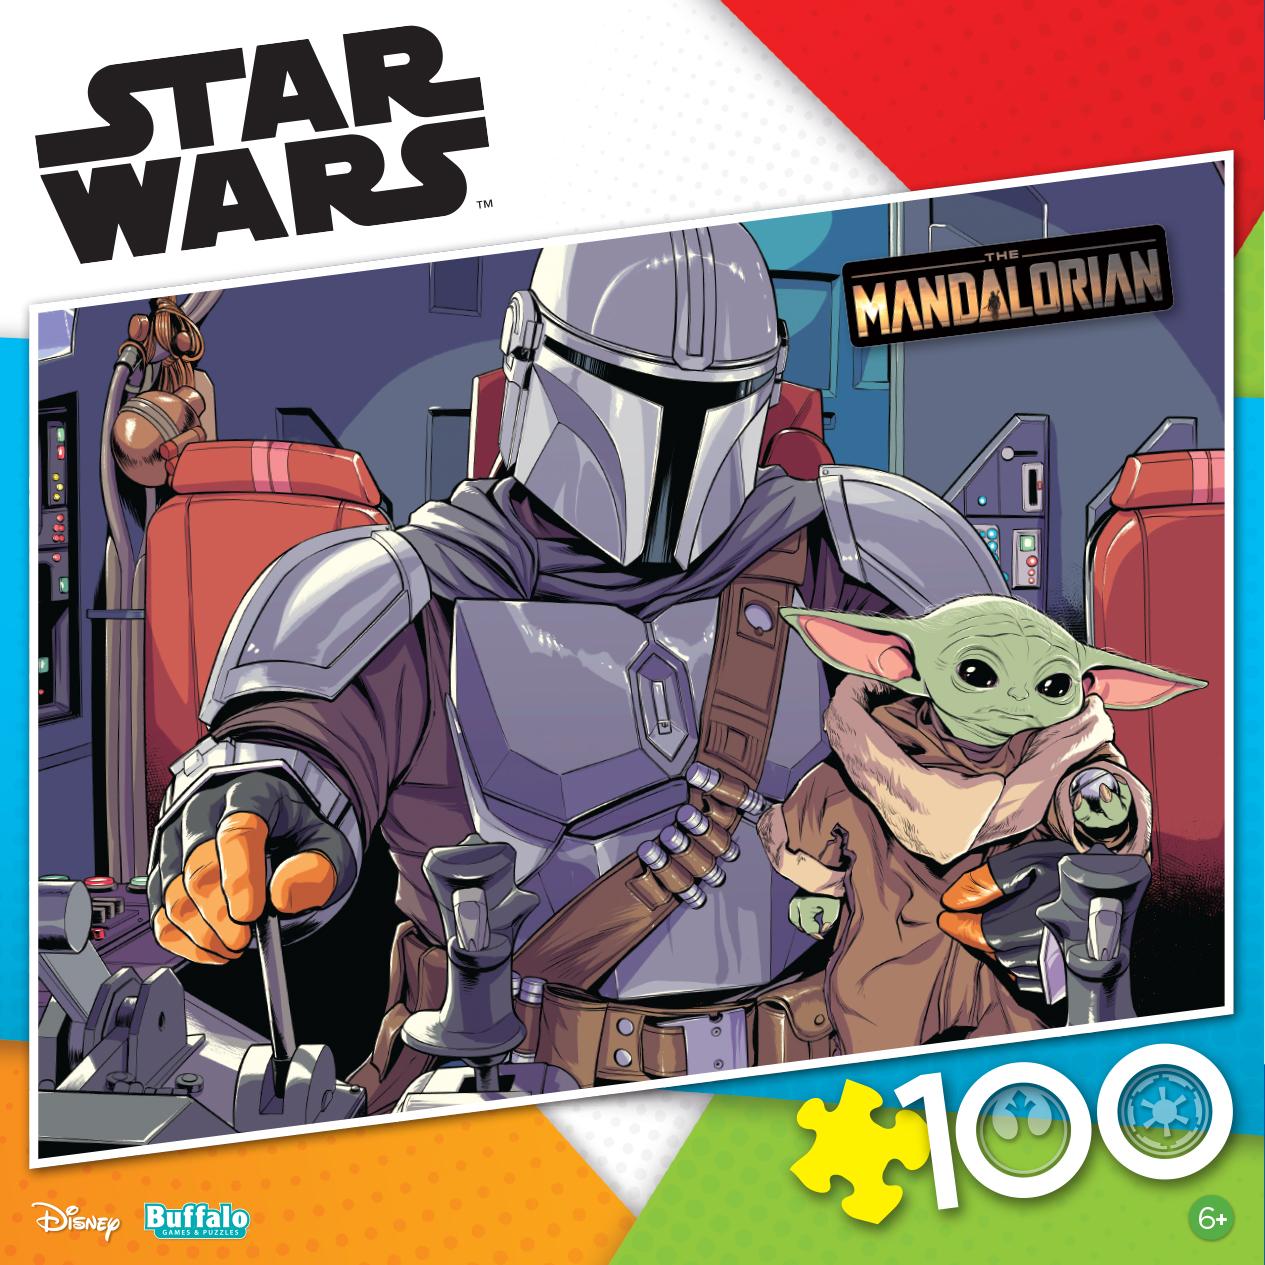 TM Mando and The Child 100 Piece Jigsaw Puzzle 1